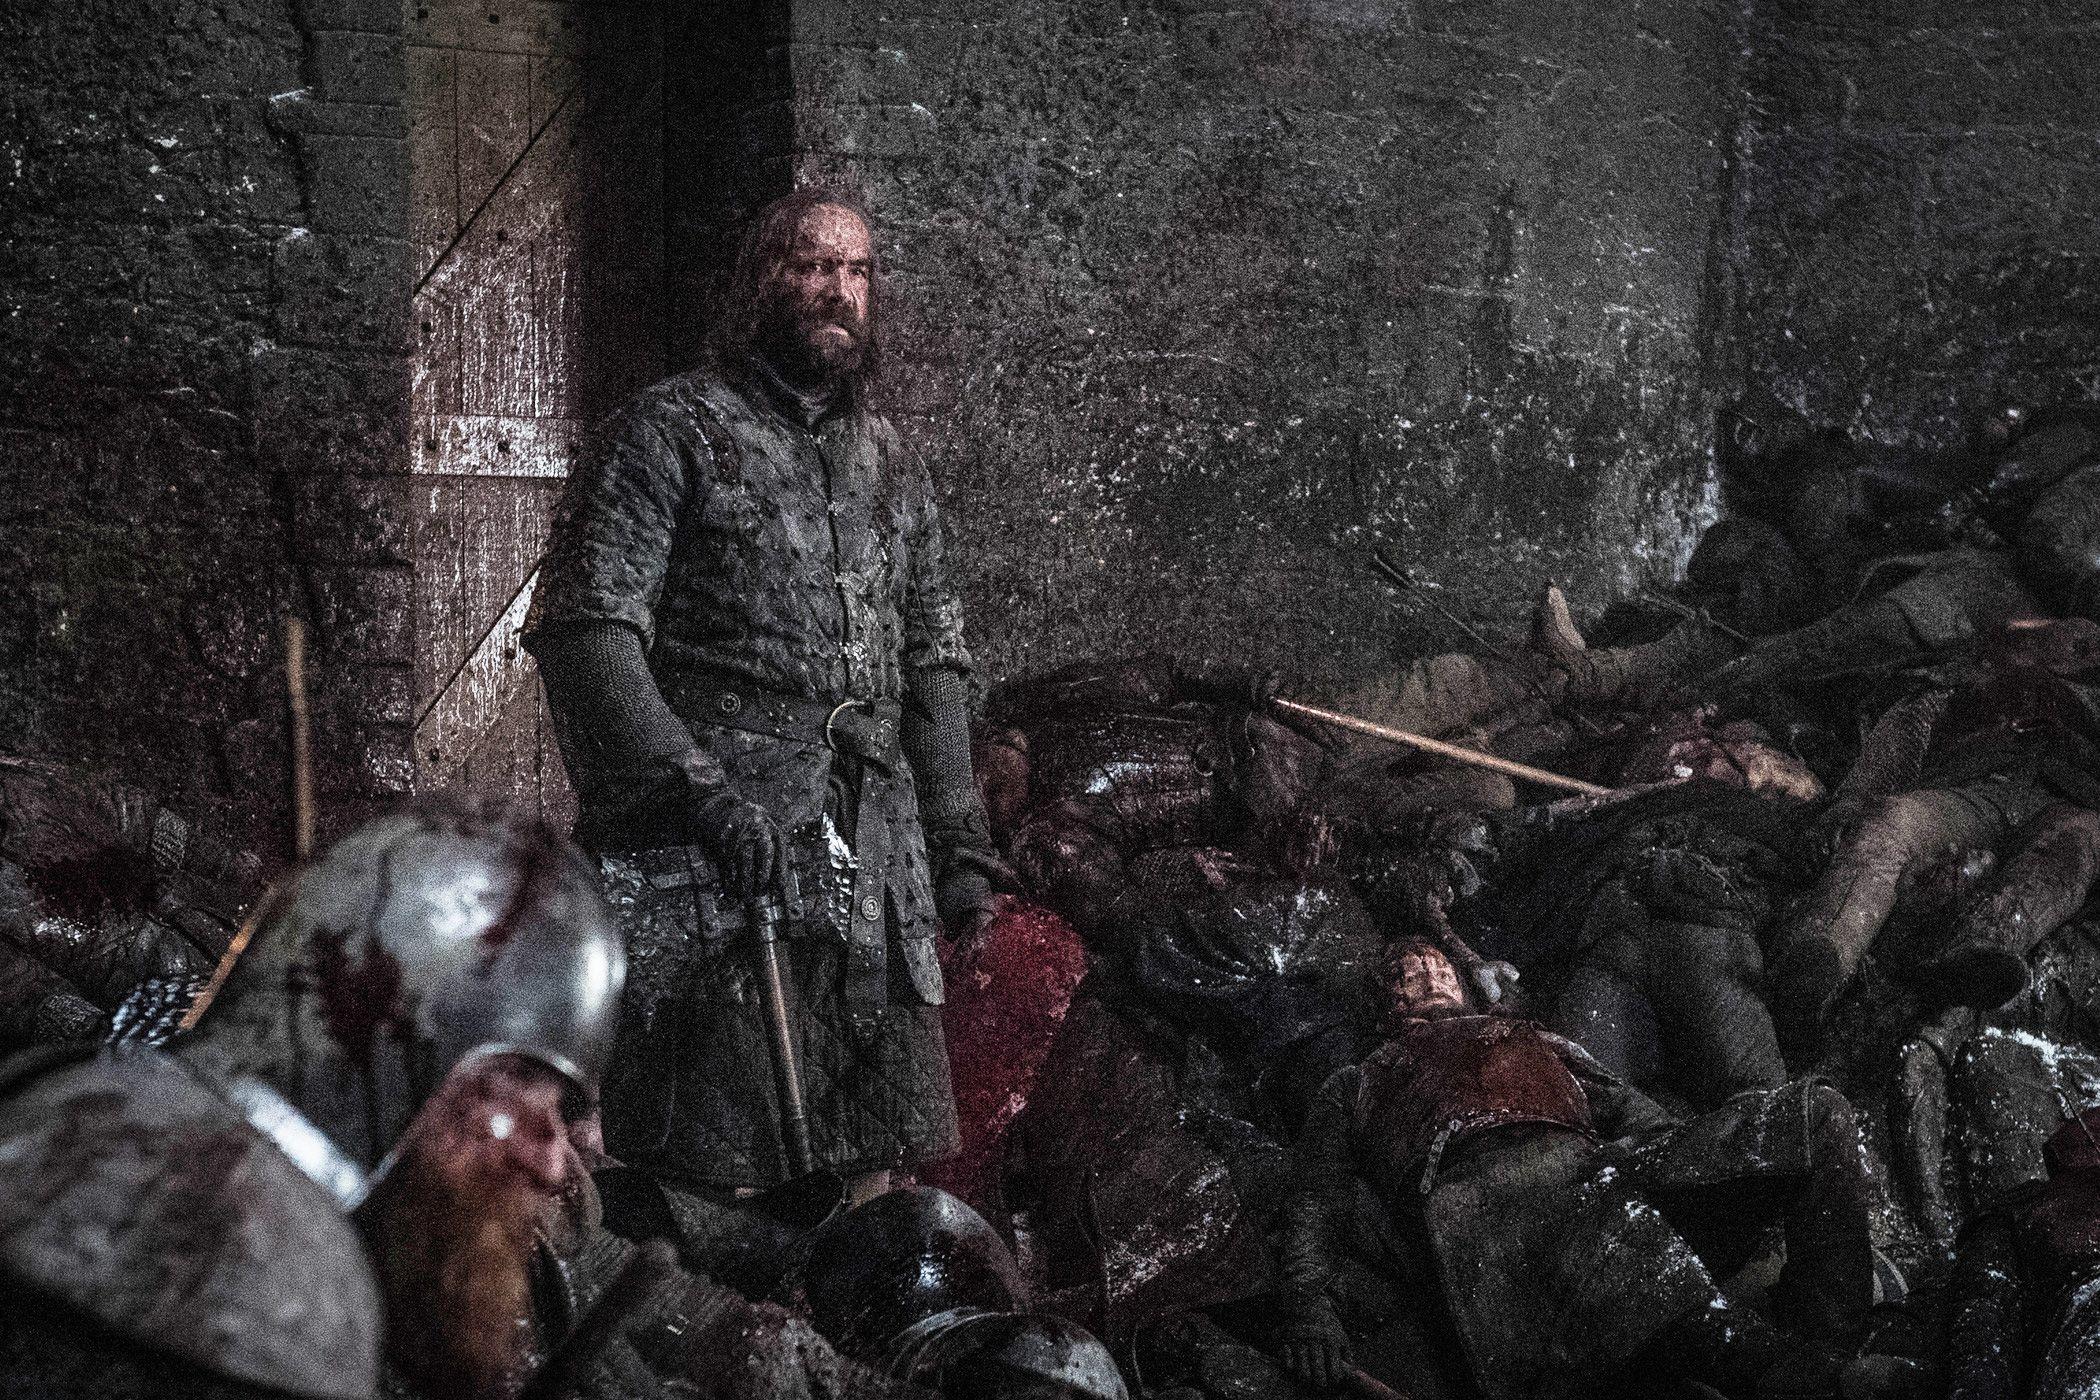 Game of Thrones, Season 8, Episode 3, Hound